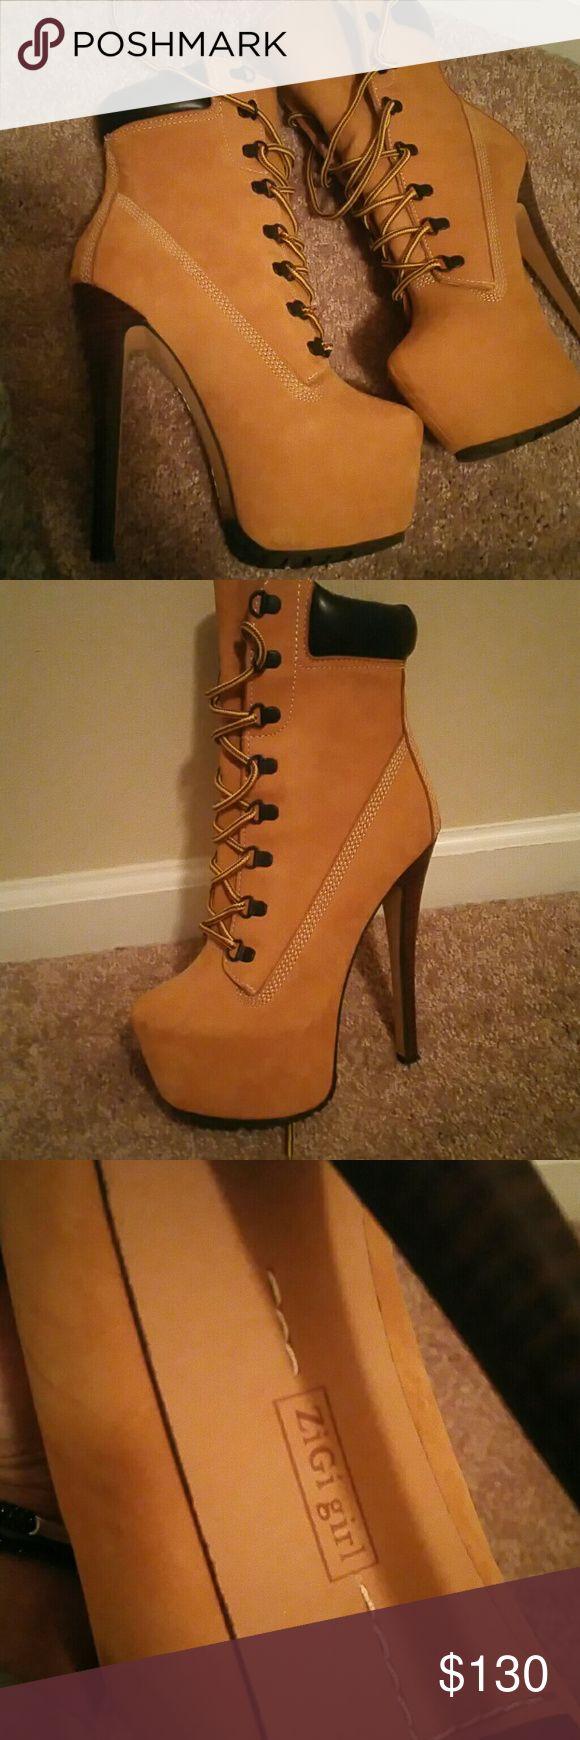 Zigi Girl Boot only Never worn.. Timberland style Zigi Girl Boot size 7.5 Zigi Soho Shoes Ankle Boots & Booties